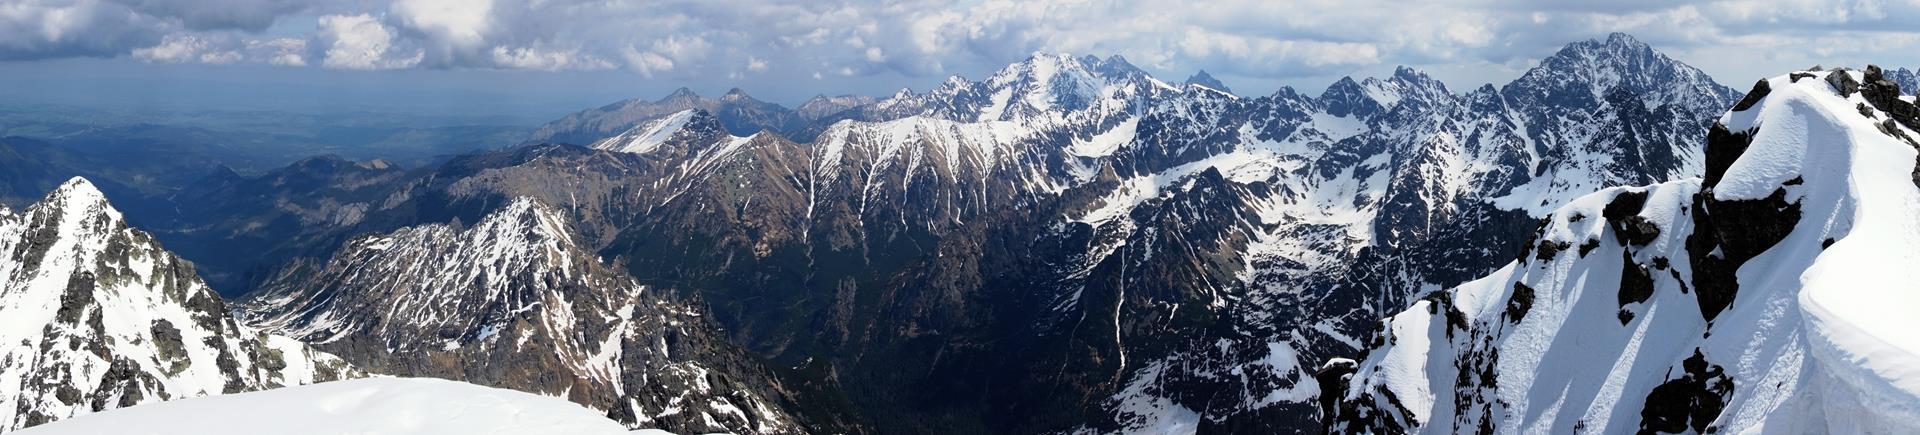 panorama, strona polska